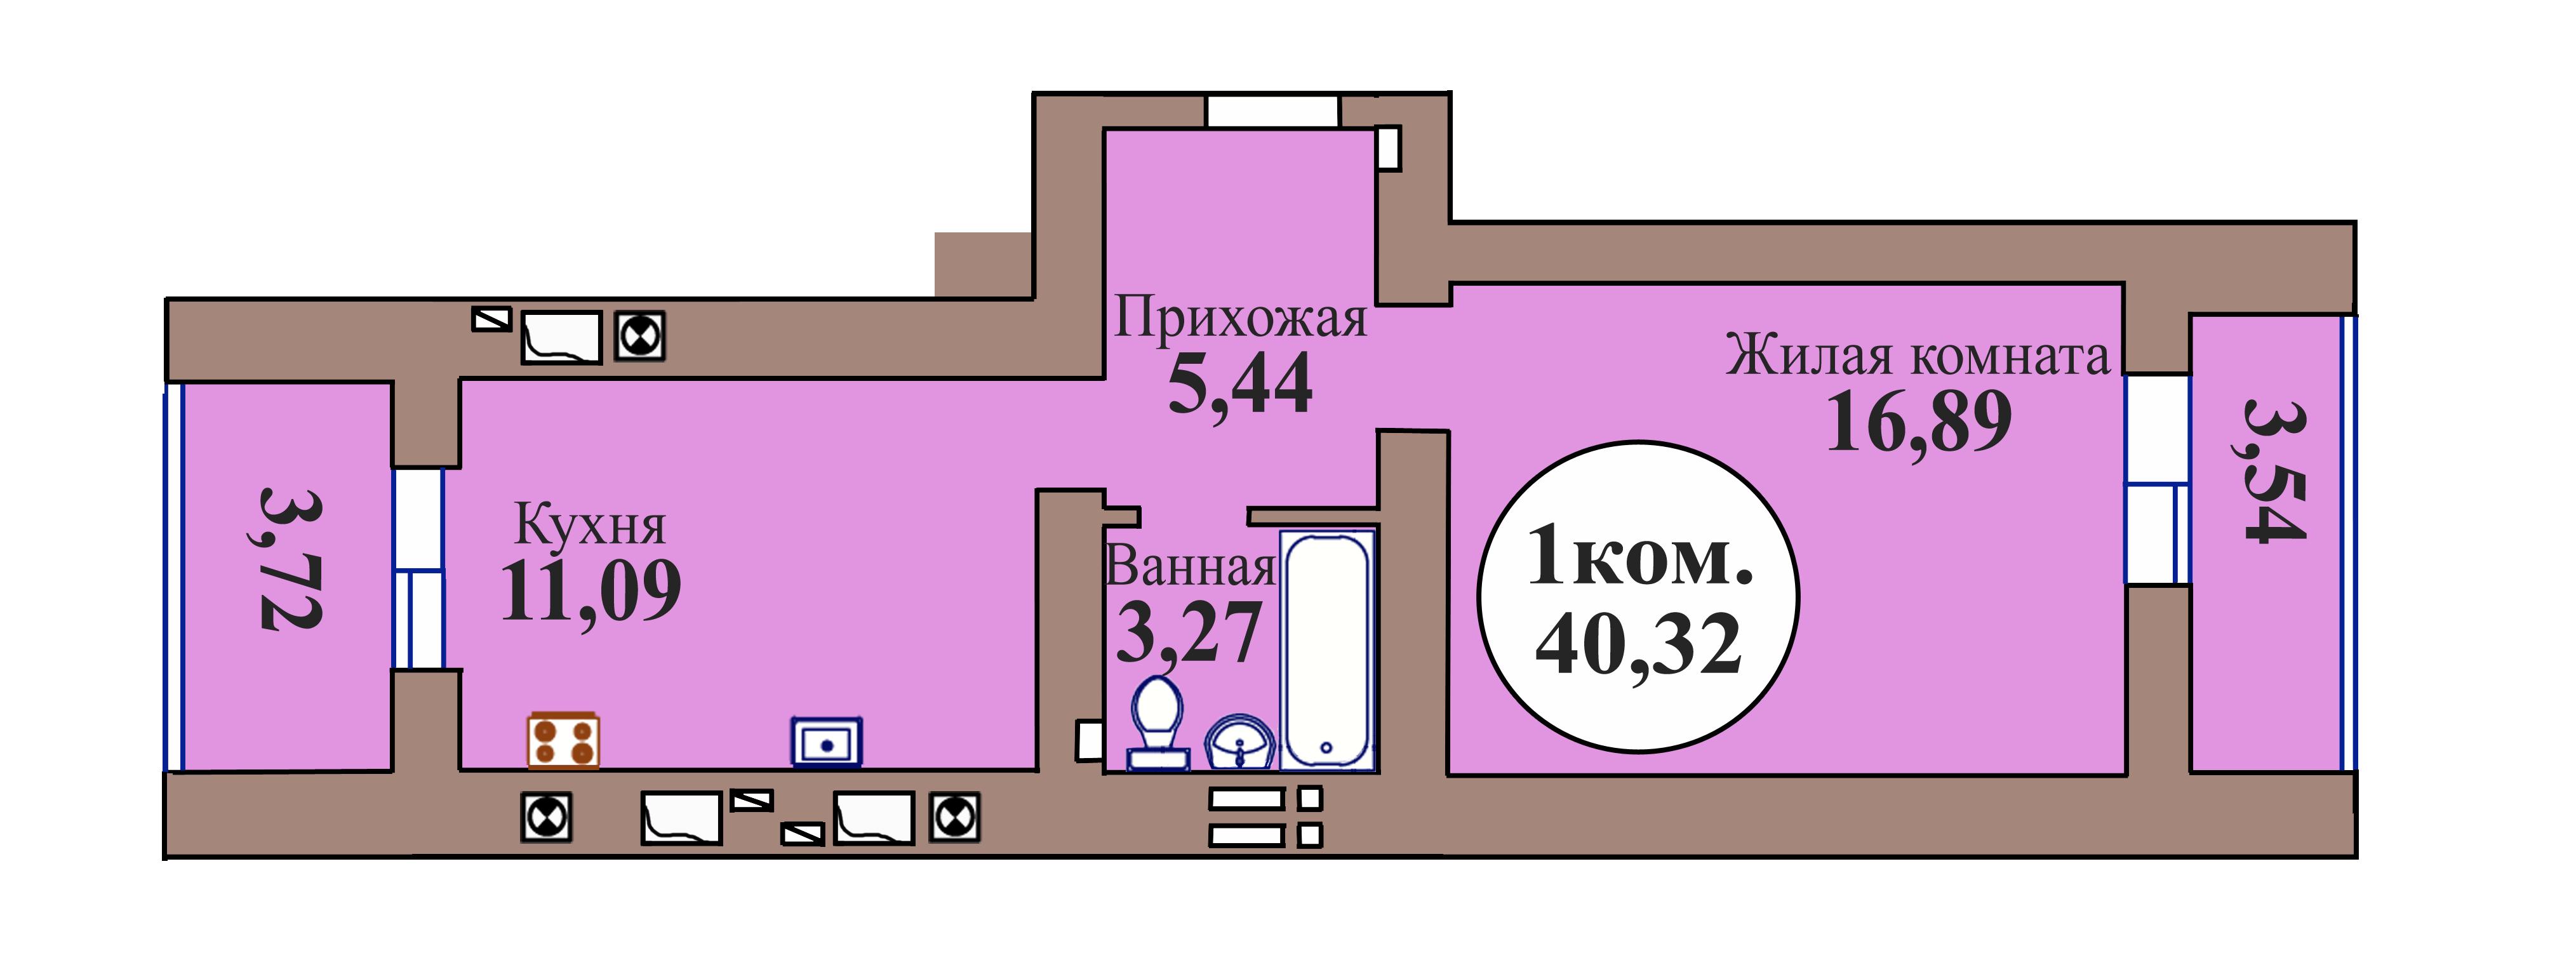 1-комн. кв. по пер. Калининградский, 5 кв. 42 в Калининграде